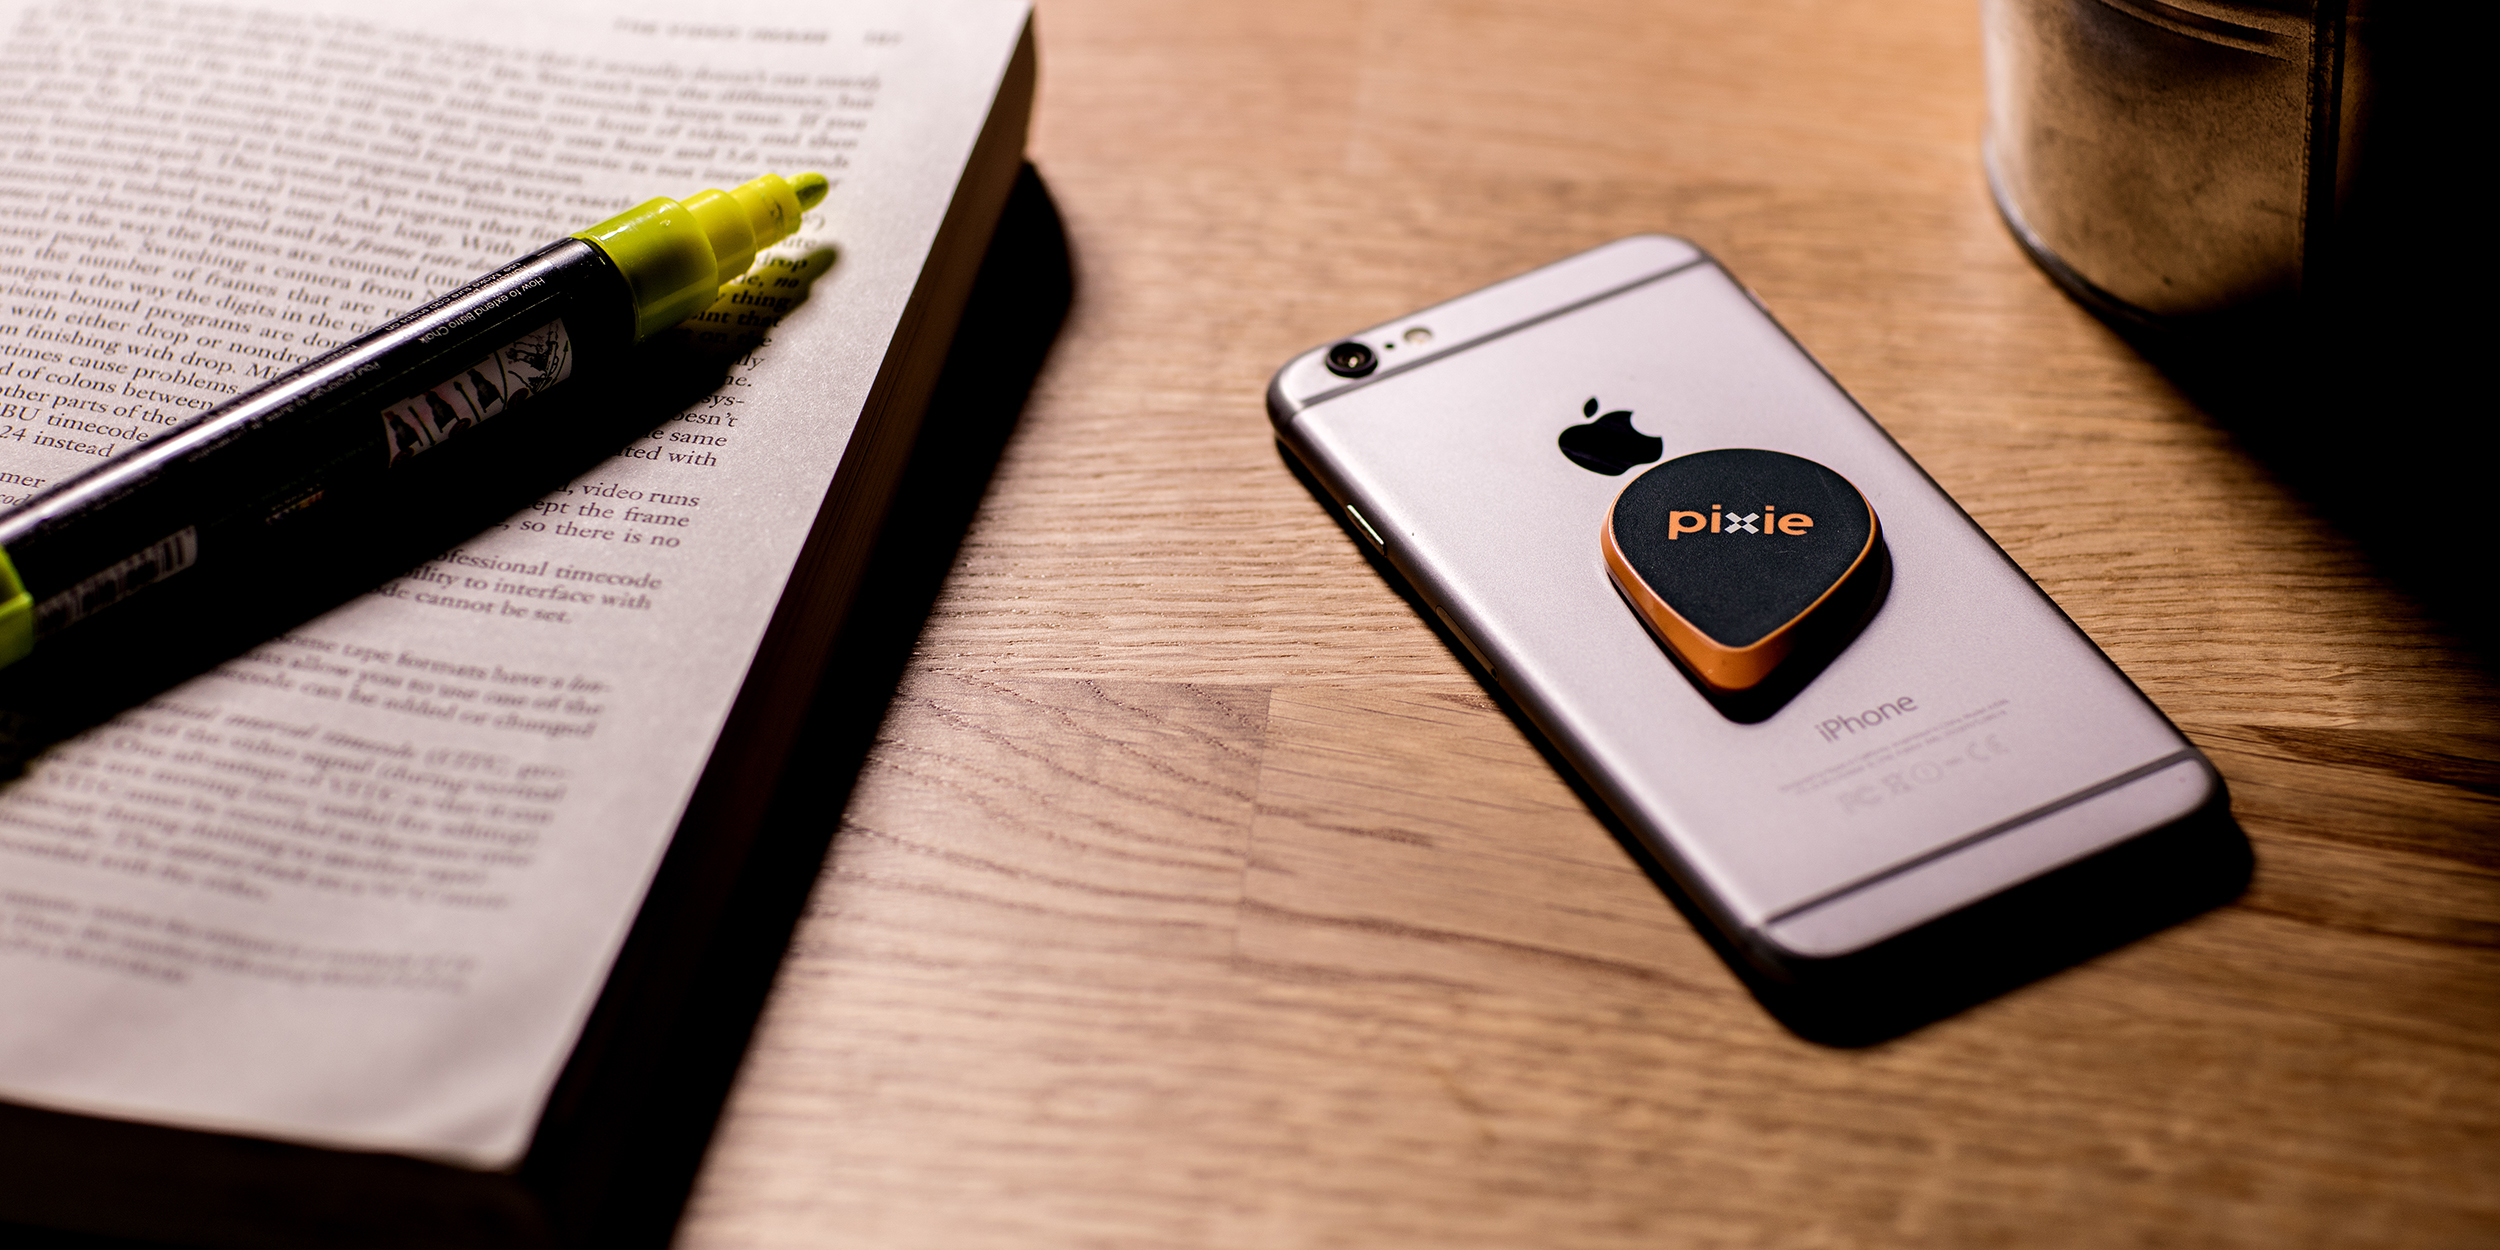 Pixie Bluetooth Tracker.